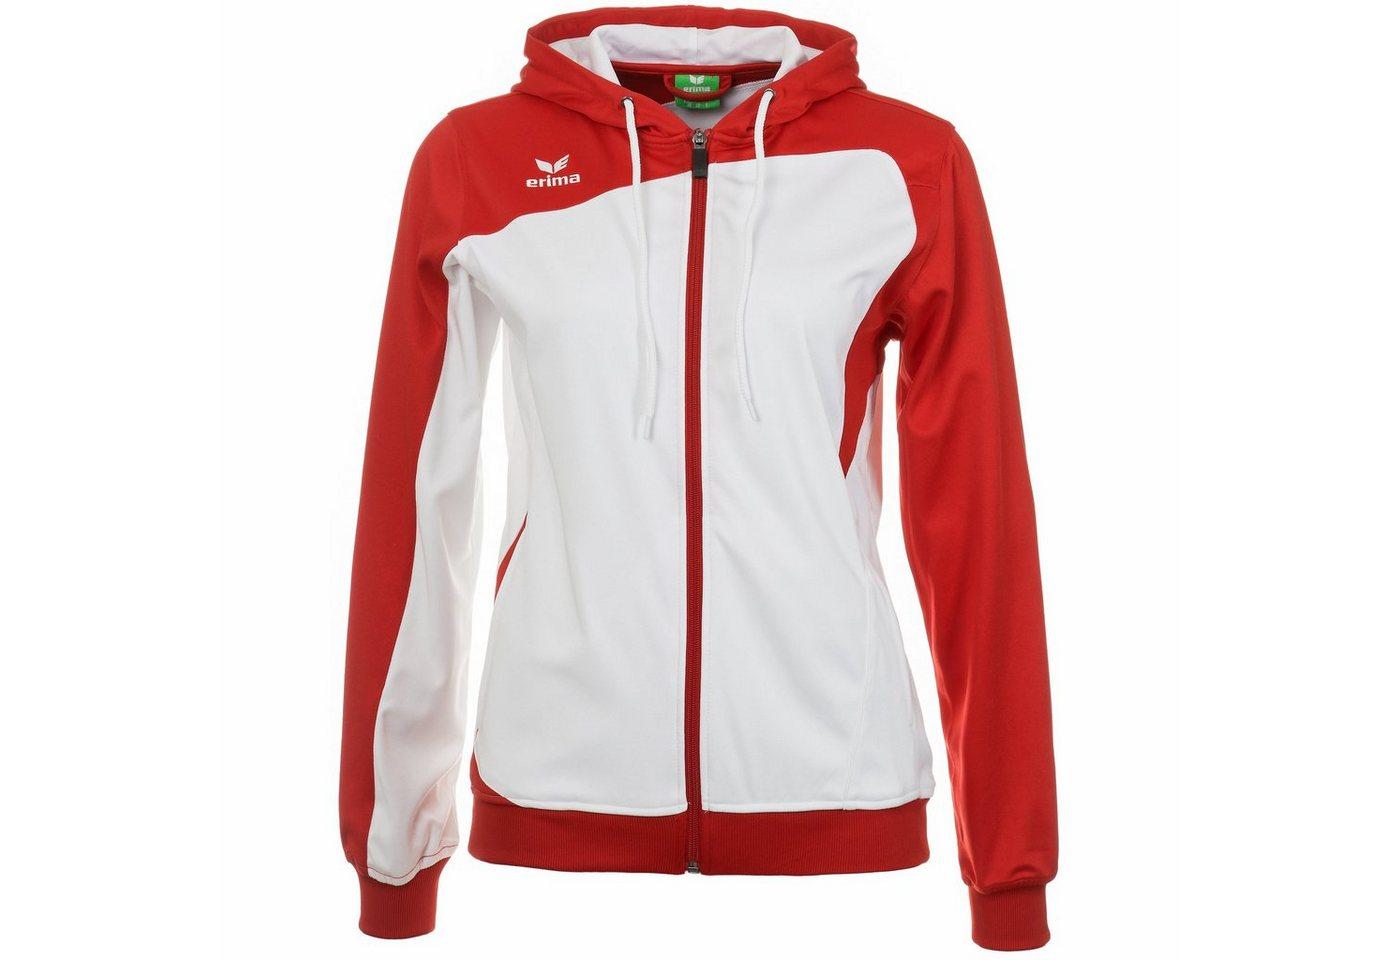 Erima Club 1900 Trainingsjacke mit Kapuze Damen | Sportbekleidung > Sportjacken > Trainingsjacken | Weiß | Polyester | Erima